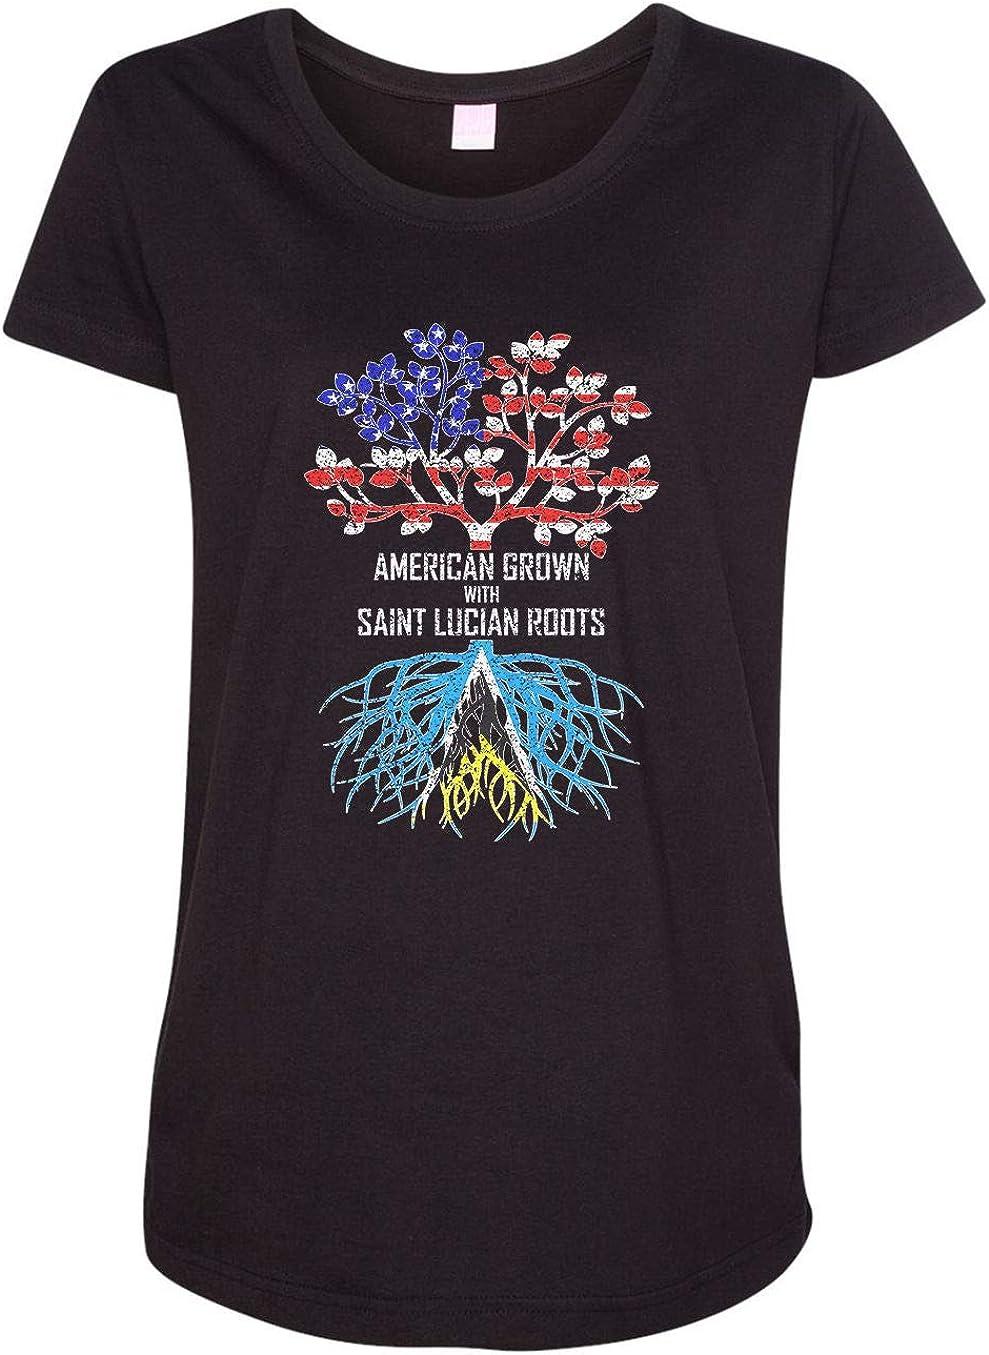 HARD EDGE DESIGN Women's American Grown with Saint Lucian Roots T-Shirt